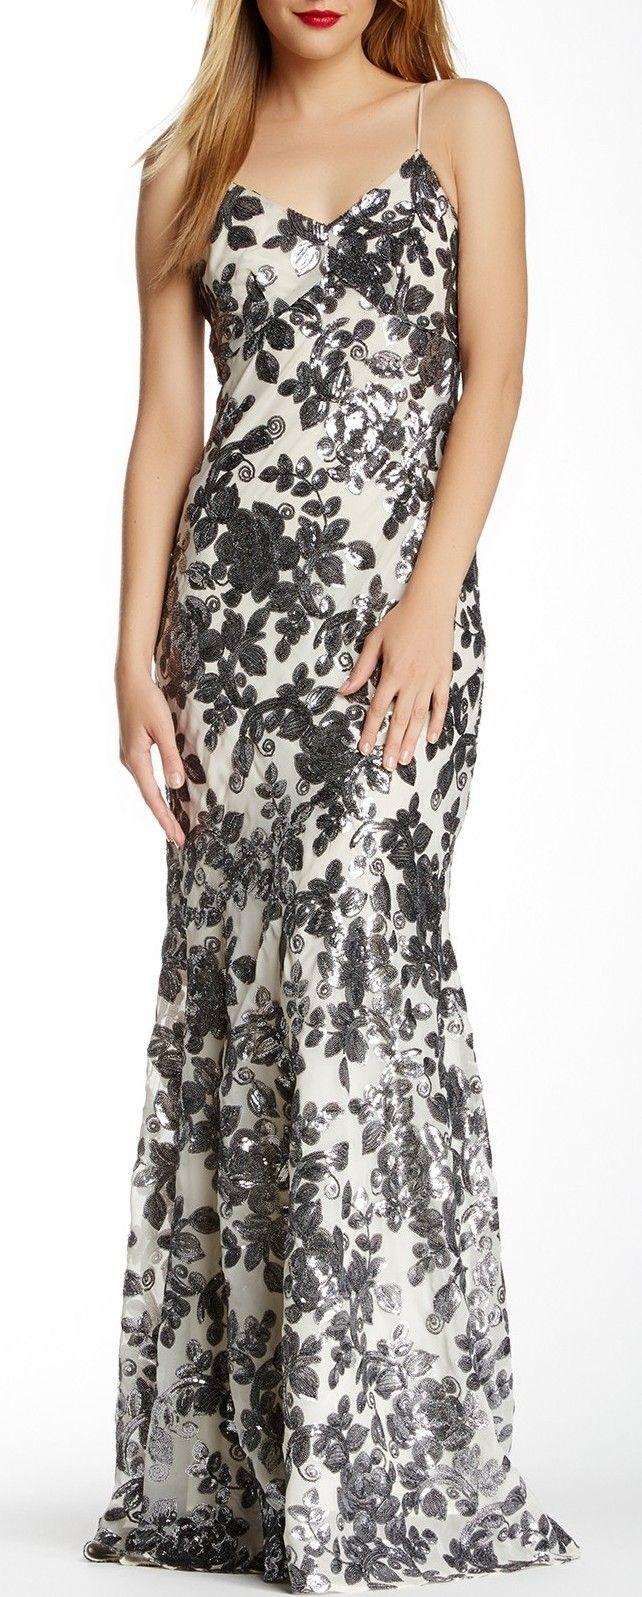 Zac posen tippy gown dresses pinterest zac posen gowns and